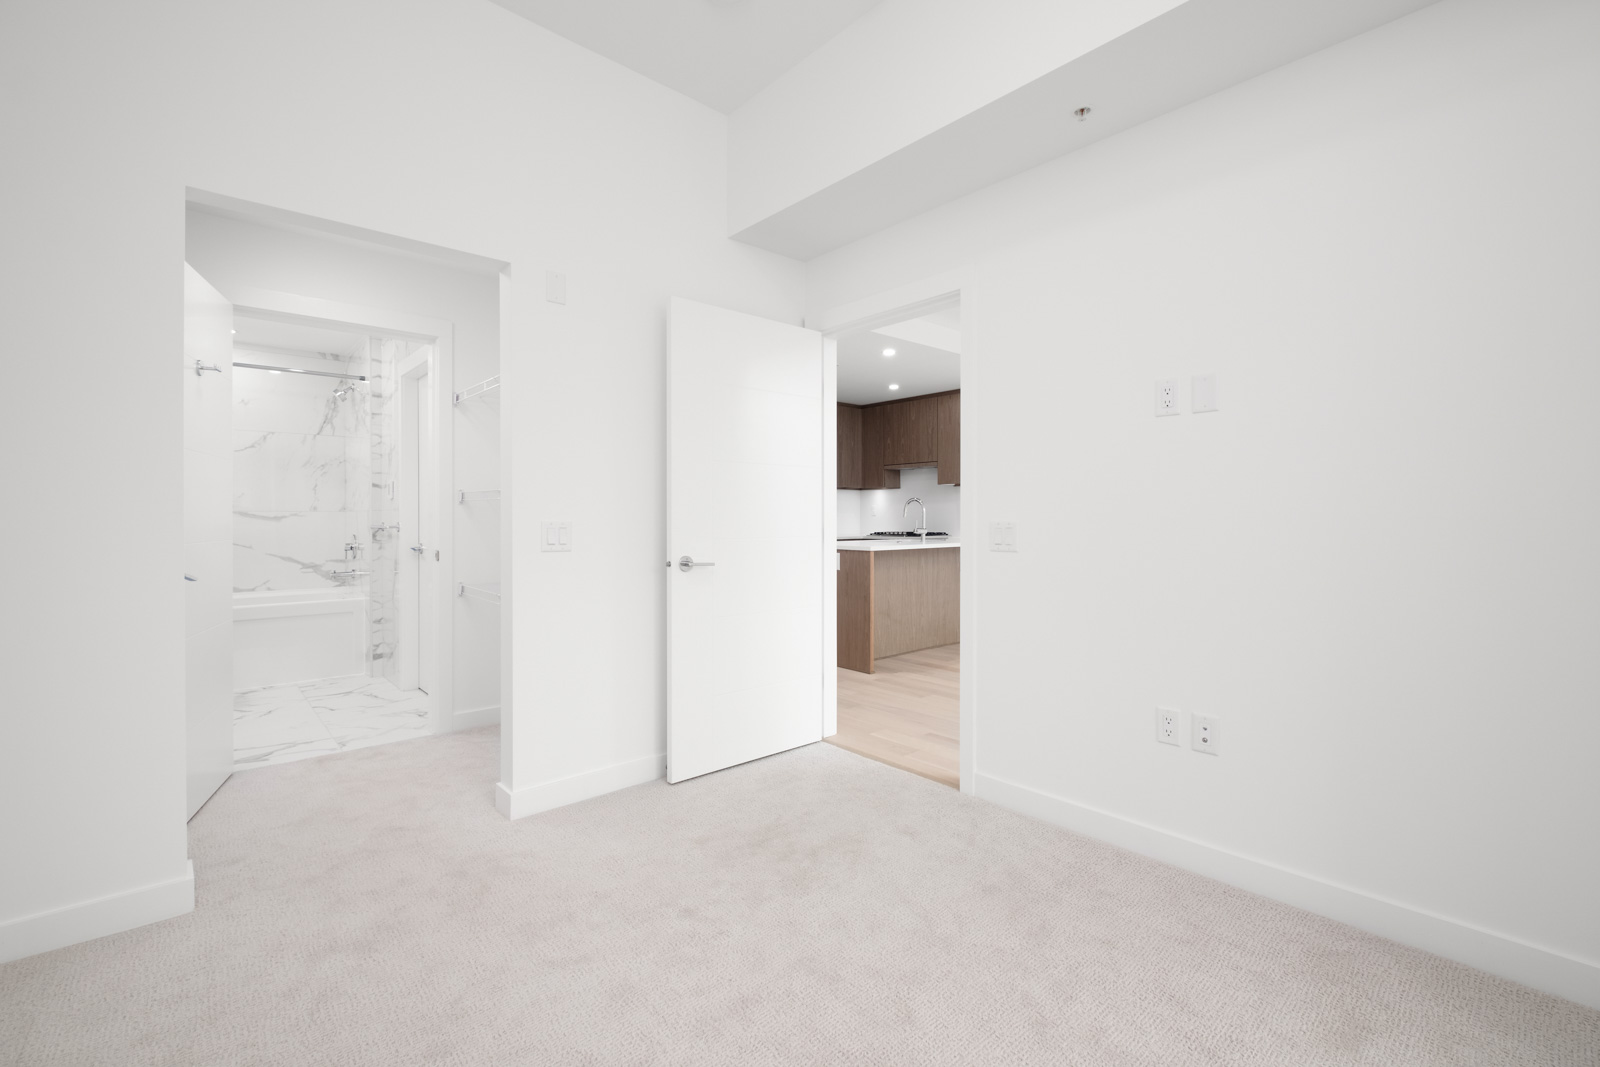 living room in rental condo in the Cambie Corridor neighbourhood of Vancouver